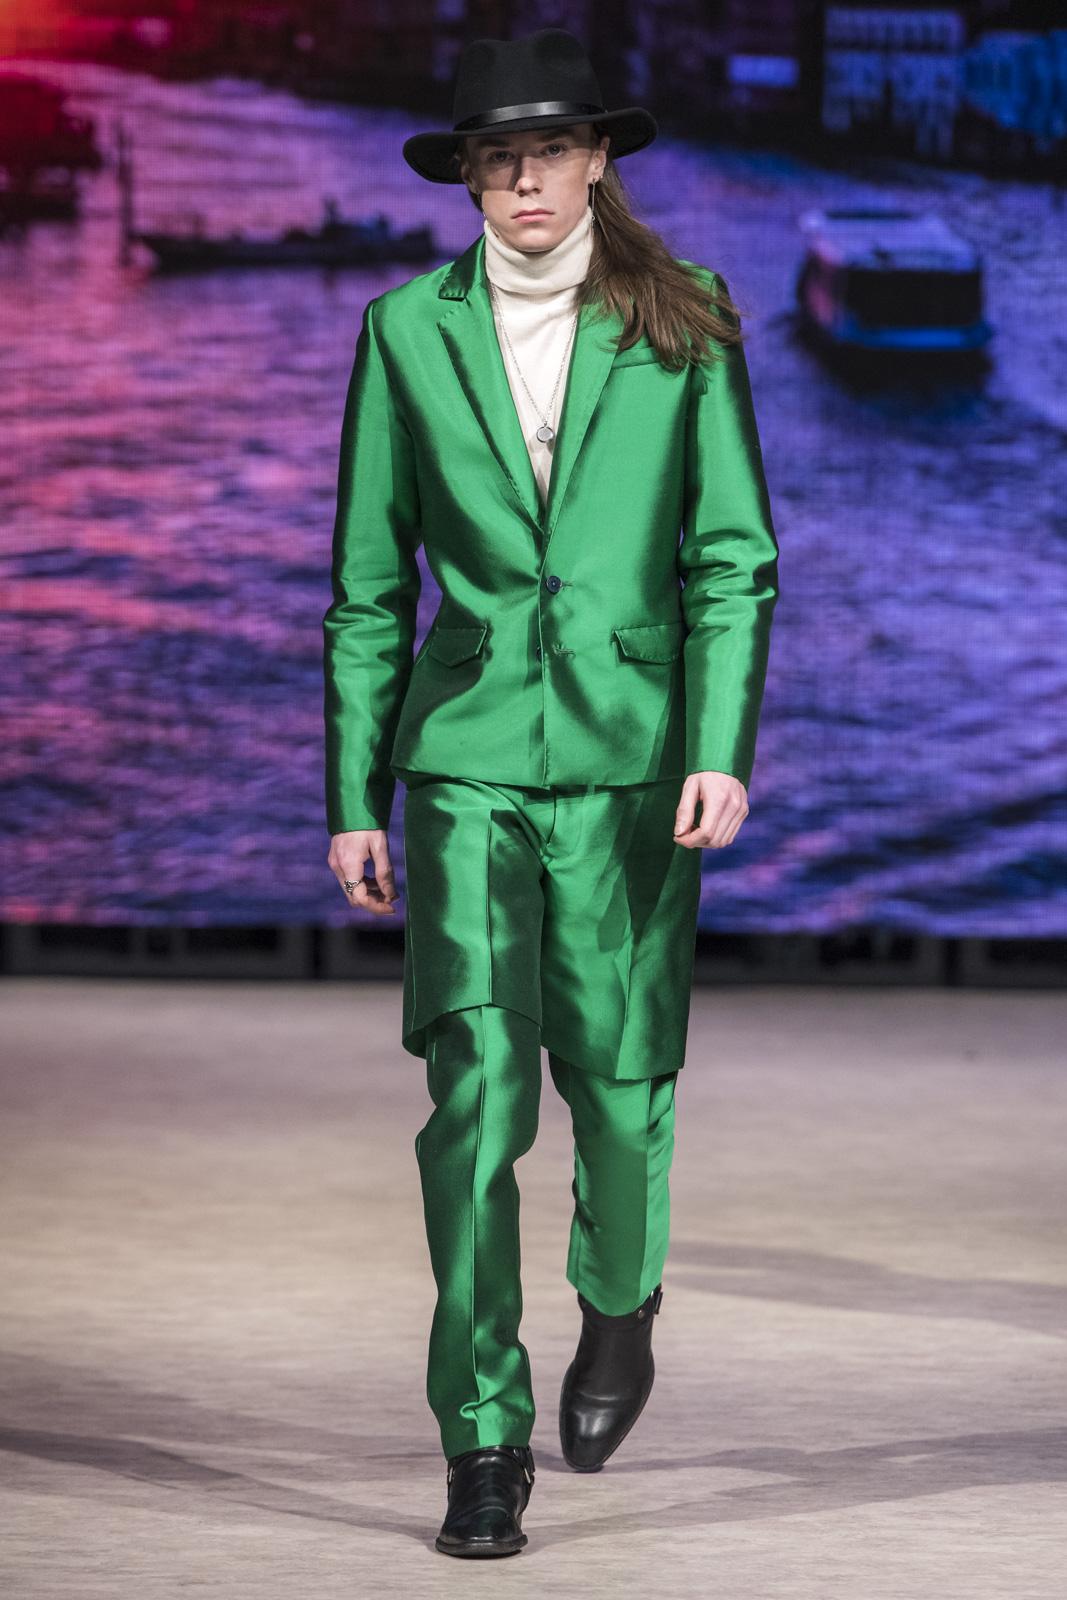 Studio Jason Siu at Vancouver Fashion Week